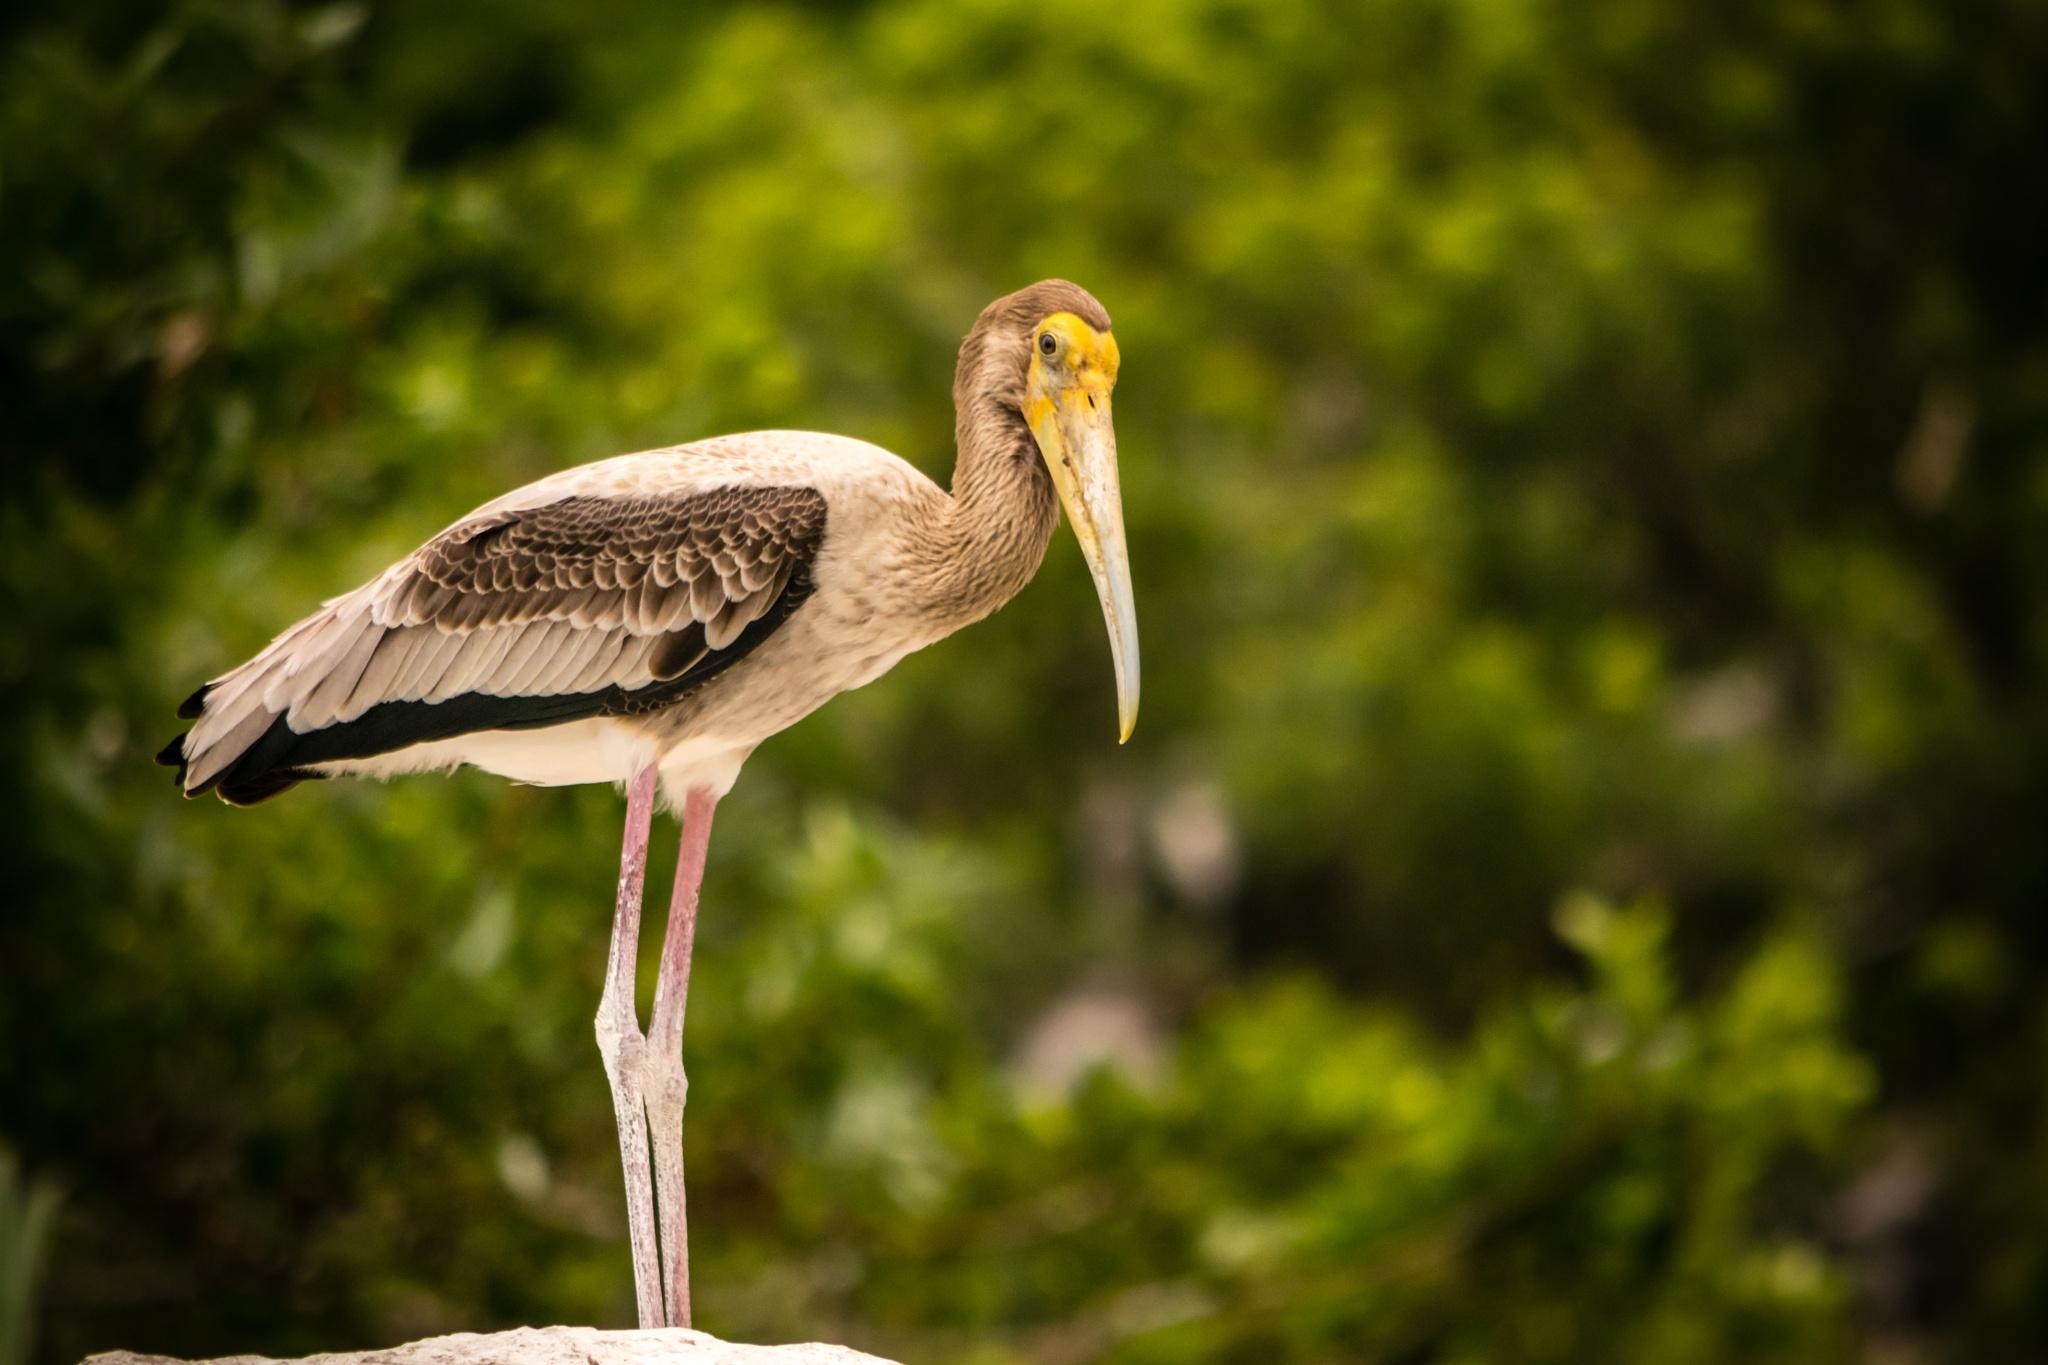 The Painted Stork (Mycteria leucocephala) by SudeepMandal